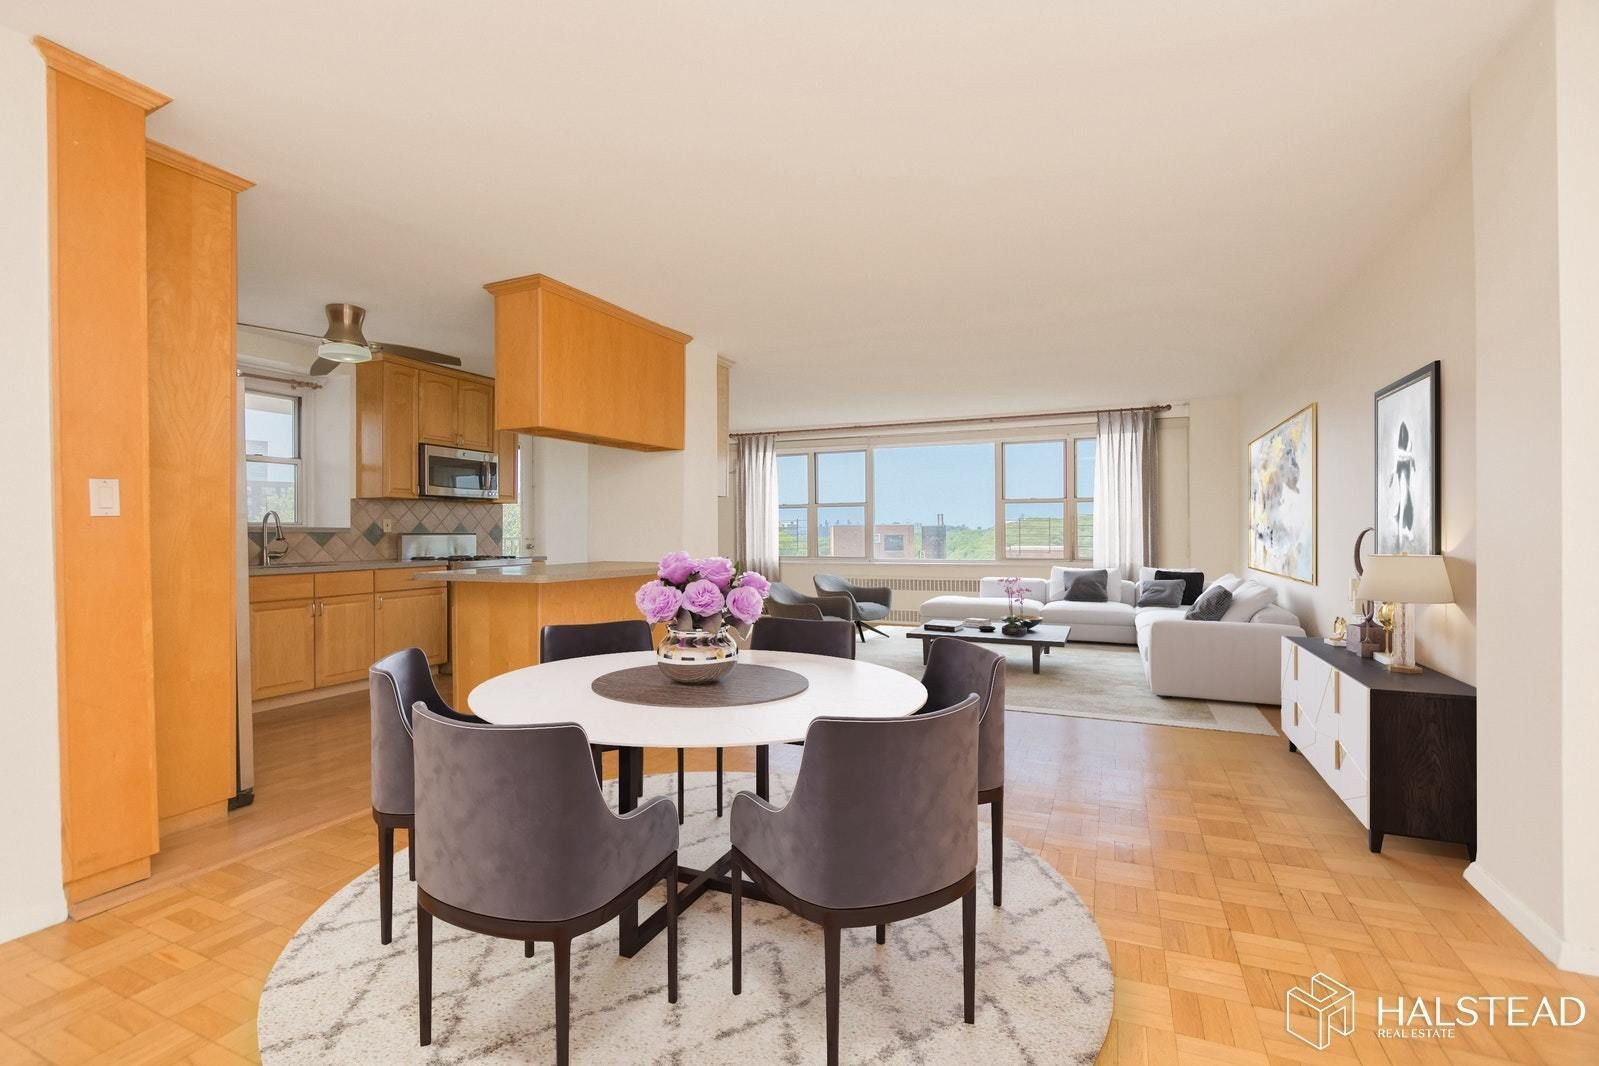 Apartment for sale at 2601 Henry Hudson Parkway, Apt 8DE